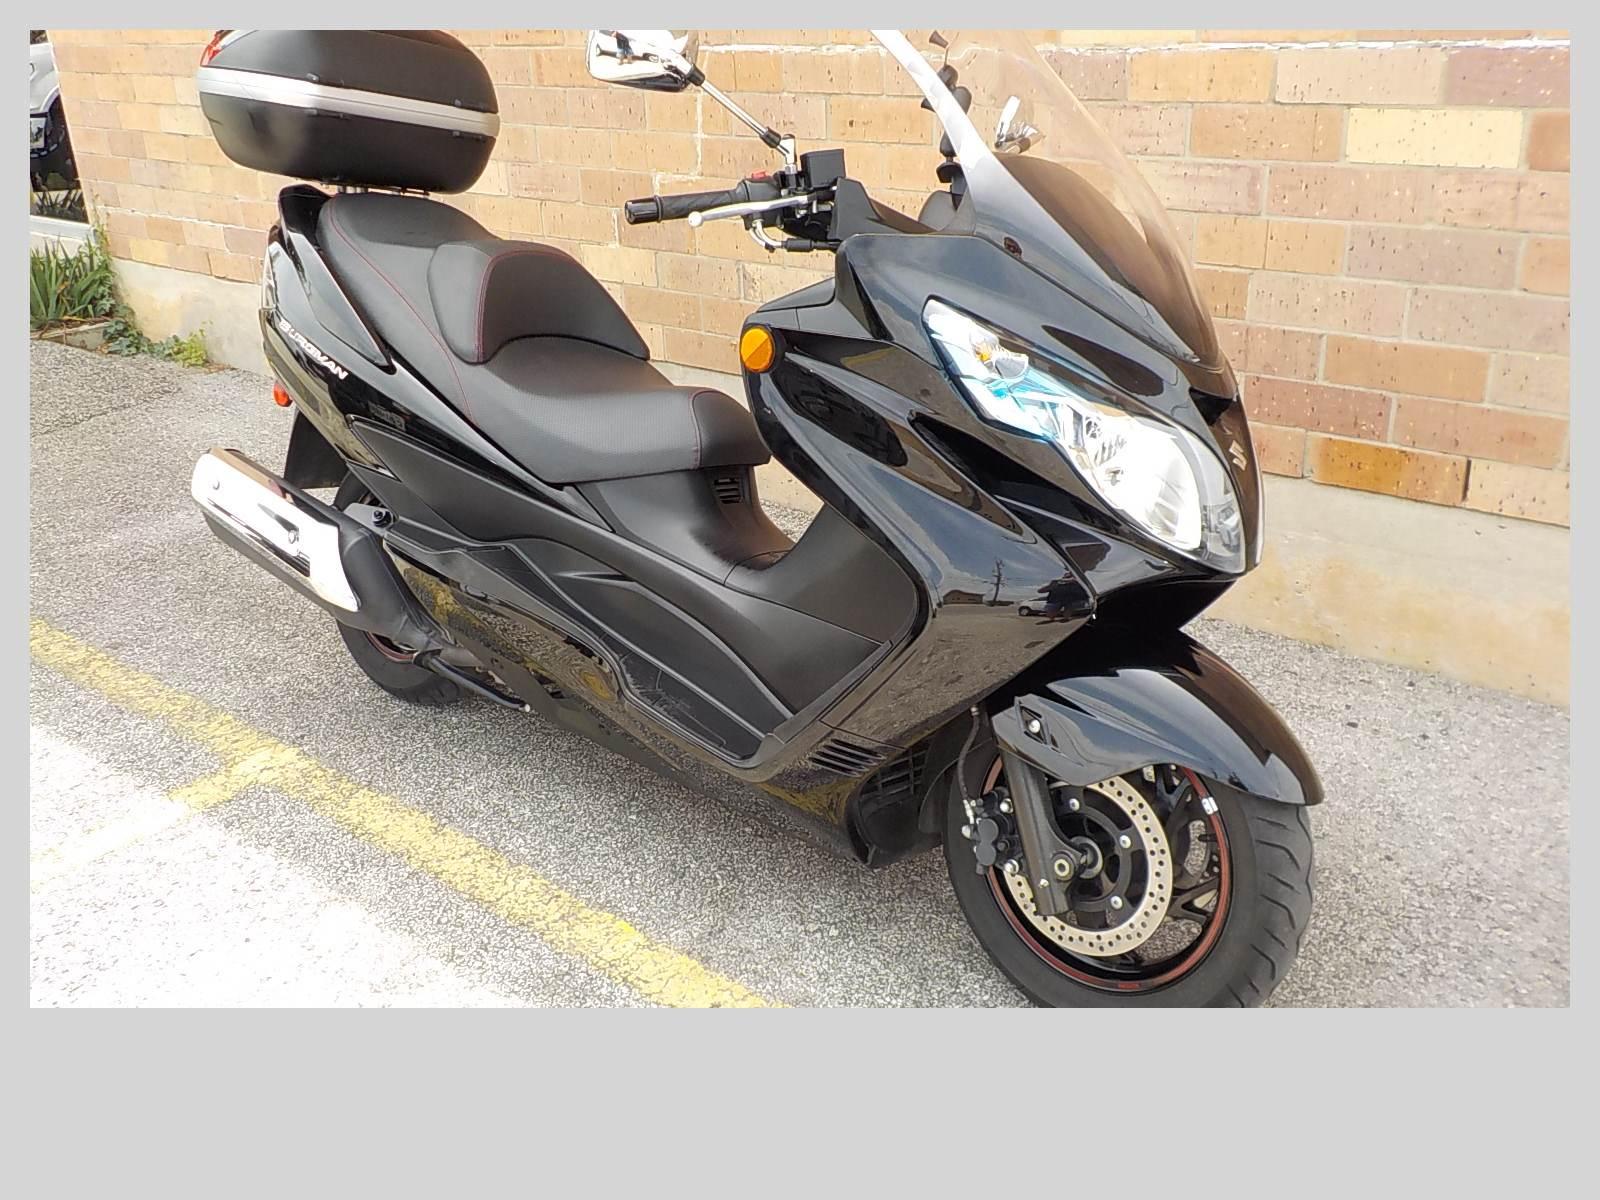 Used 2014 Suzuki Burgman™ 400 ABS Scooters in San Antonio, TX ...